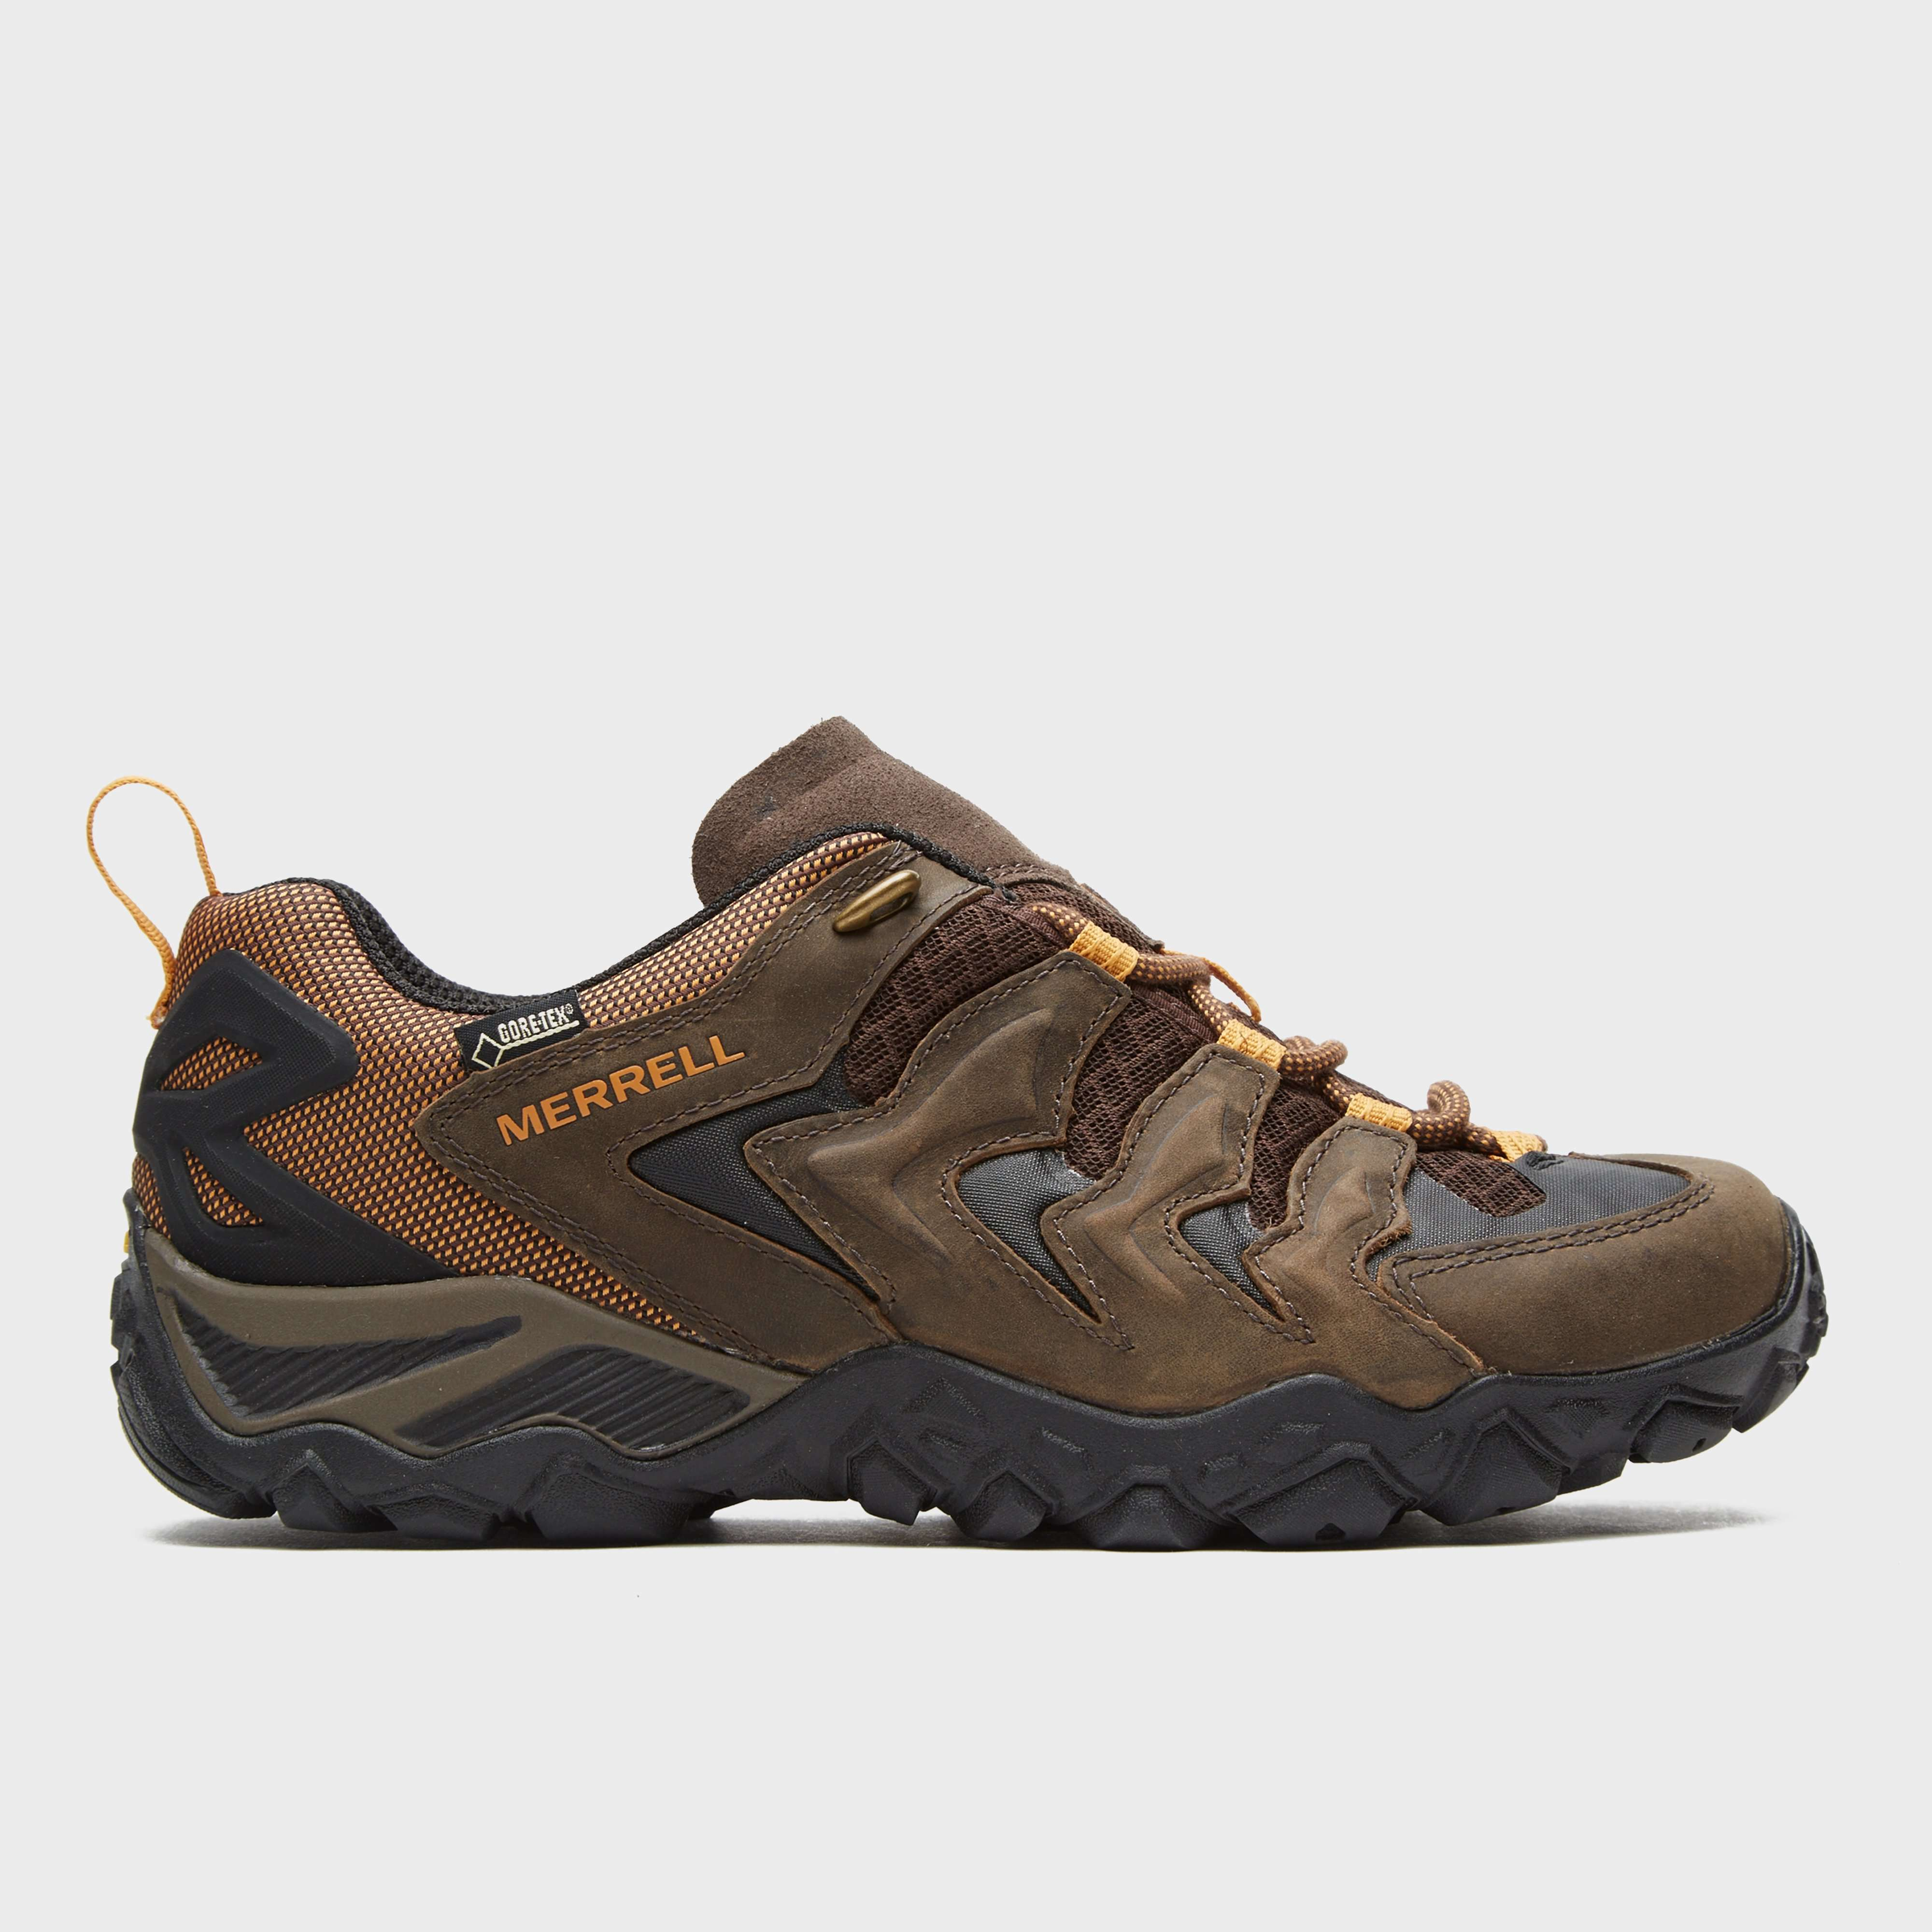 MERRELL Men's Chameleon Shift Ventilator GORE-TEX® Shoes